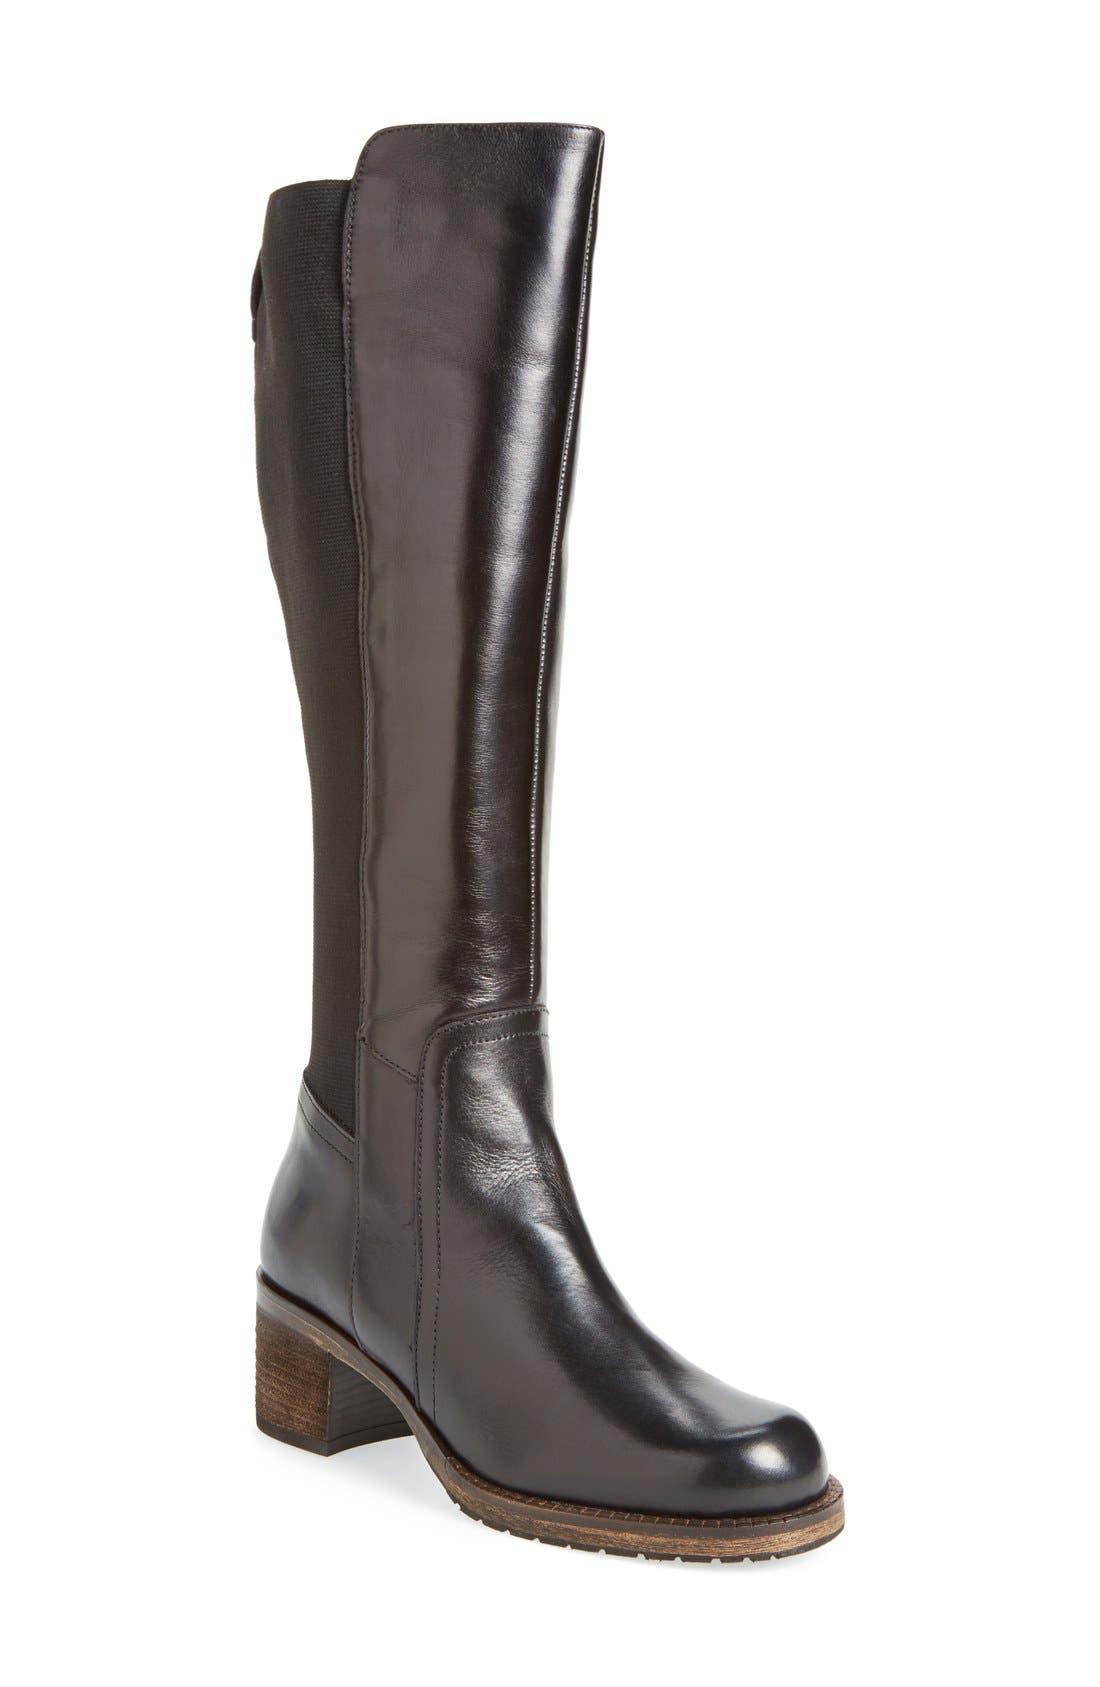 Main Image - Dune London 'Tarra' Knee High Boot (Women)